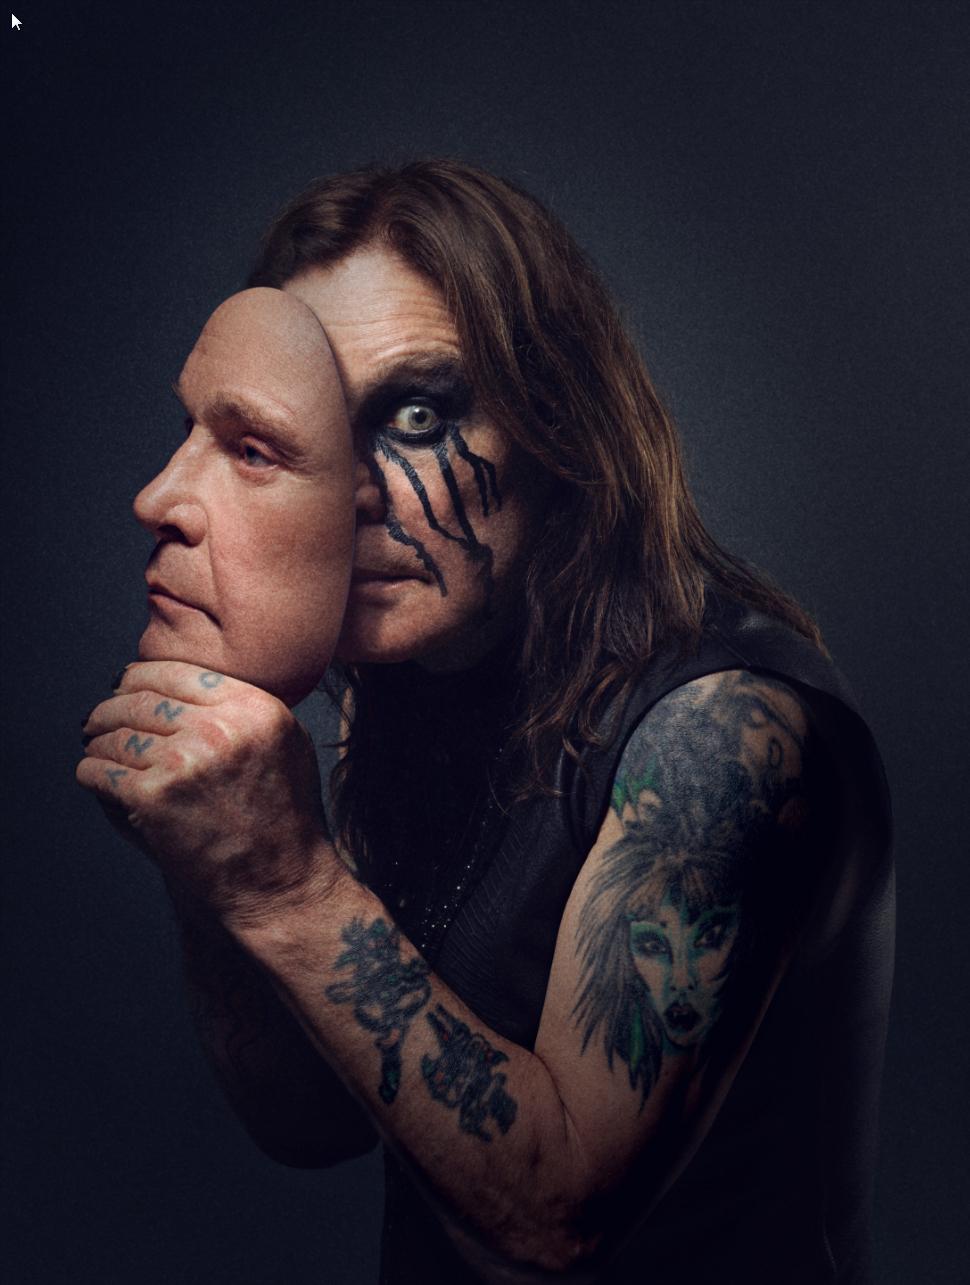 Ozzy Osbourne   Photo by Herring & Herring